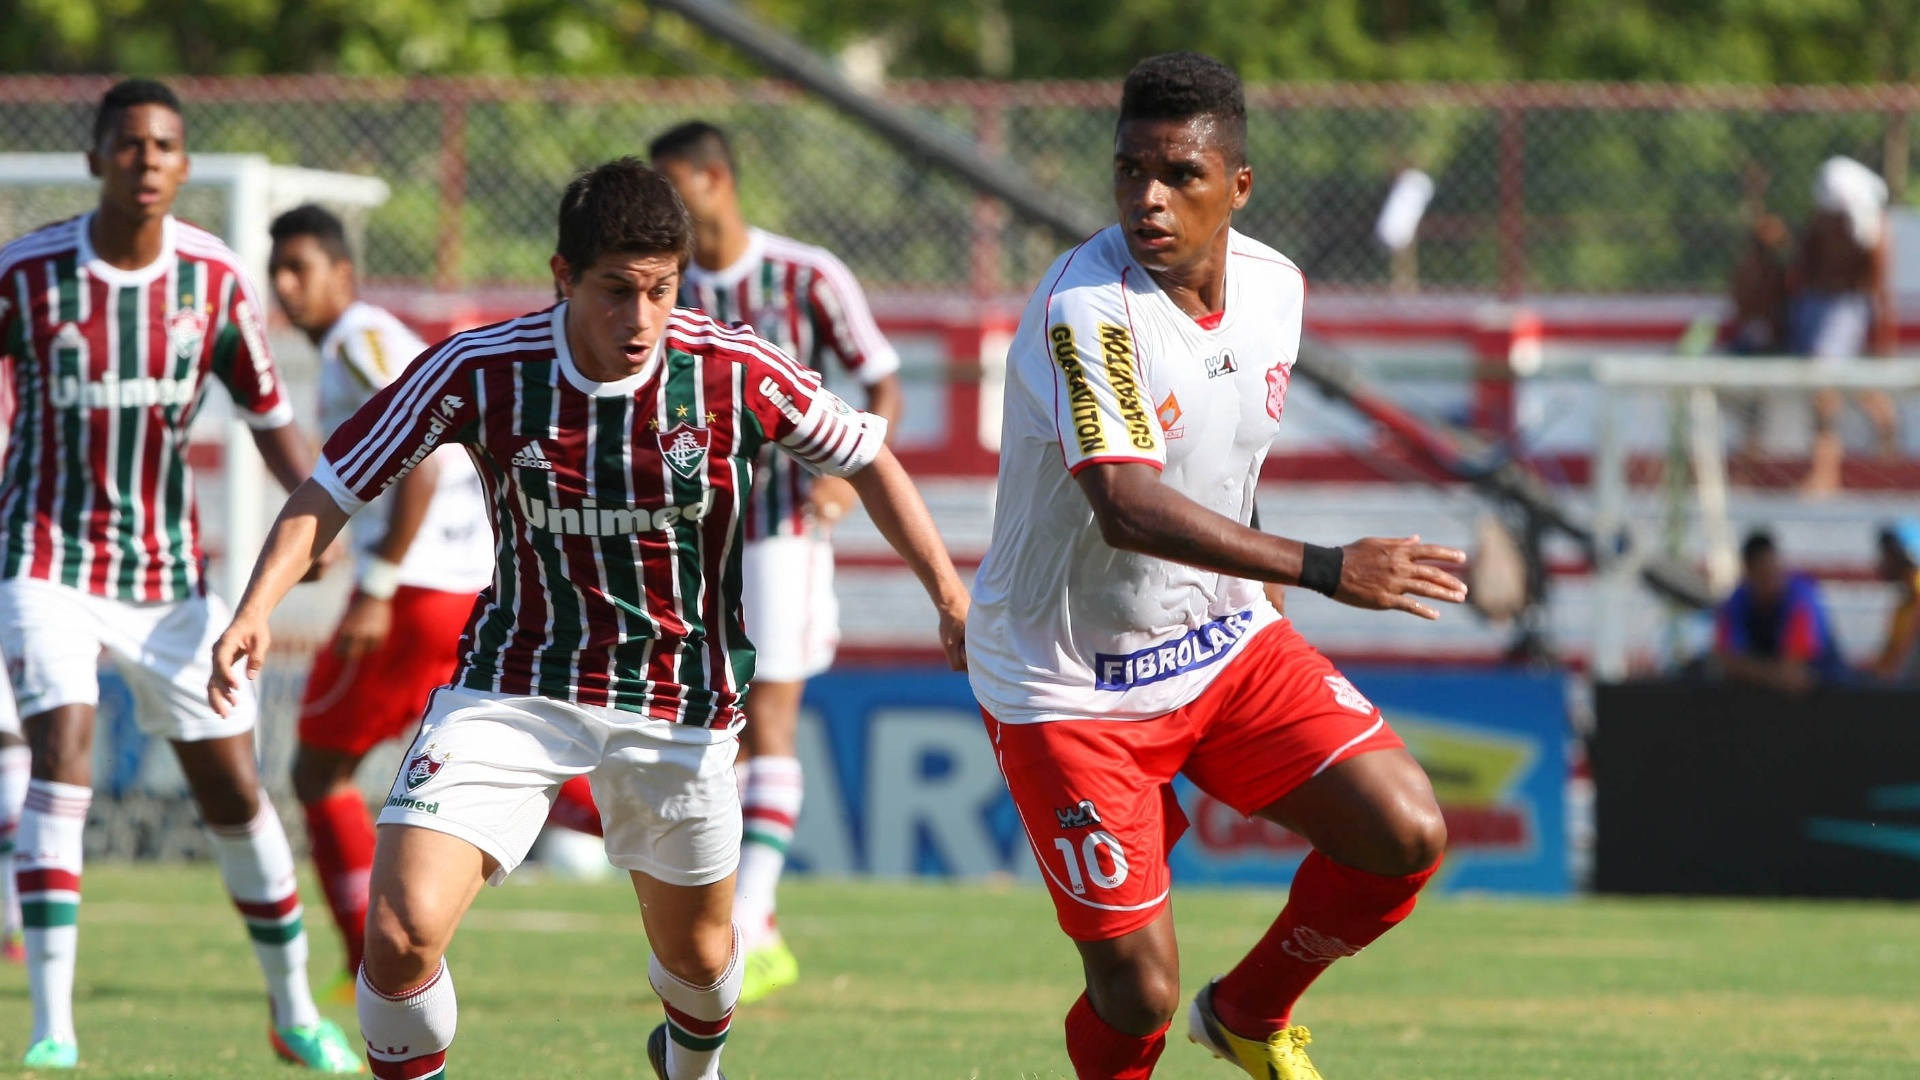 01.fev.2014 - Conca tenta recuperar a bola de Almir, na partida entre Bangu e Fluminense, pelo Campeonato Carioca. O Flu venceu por 1 a 0